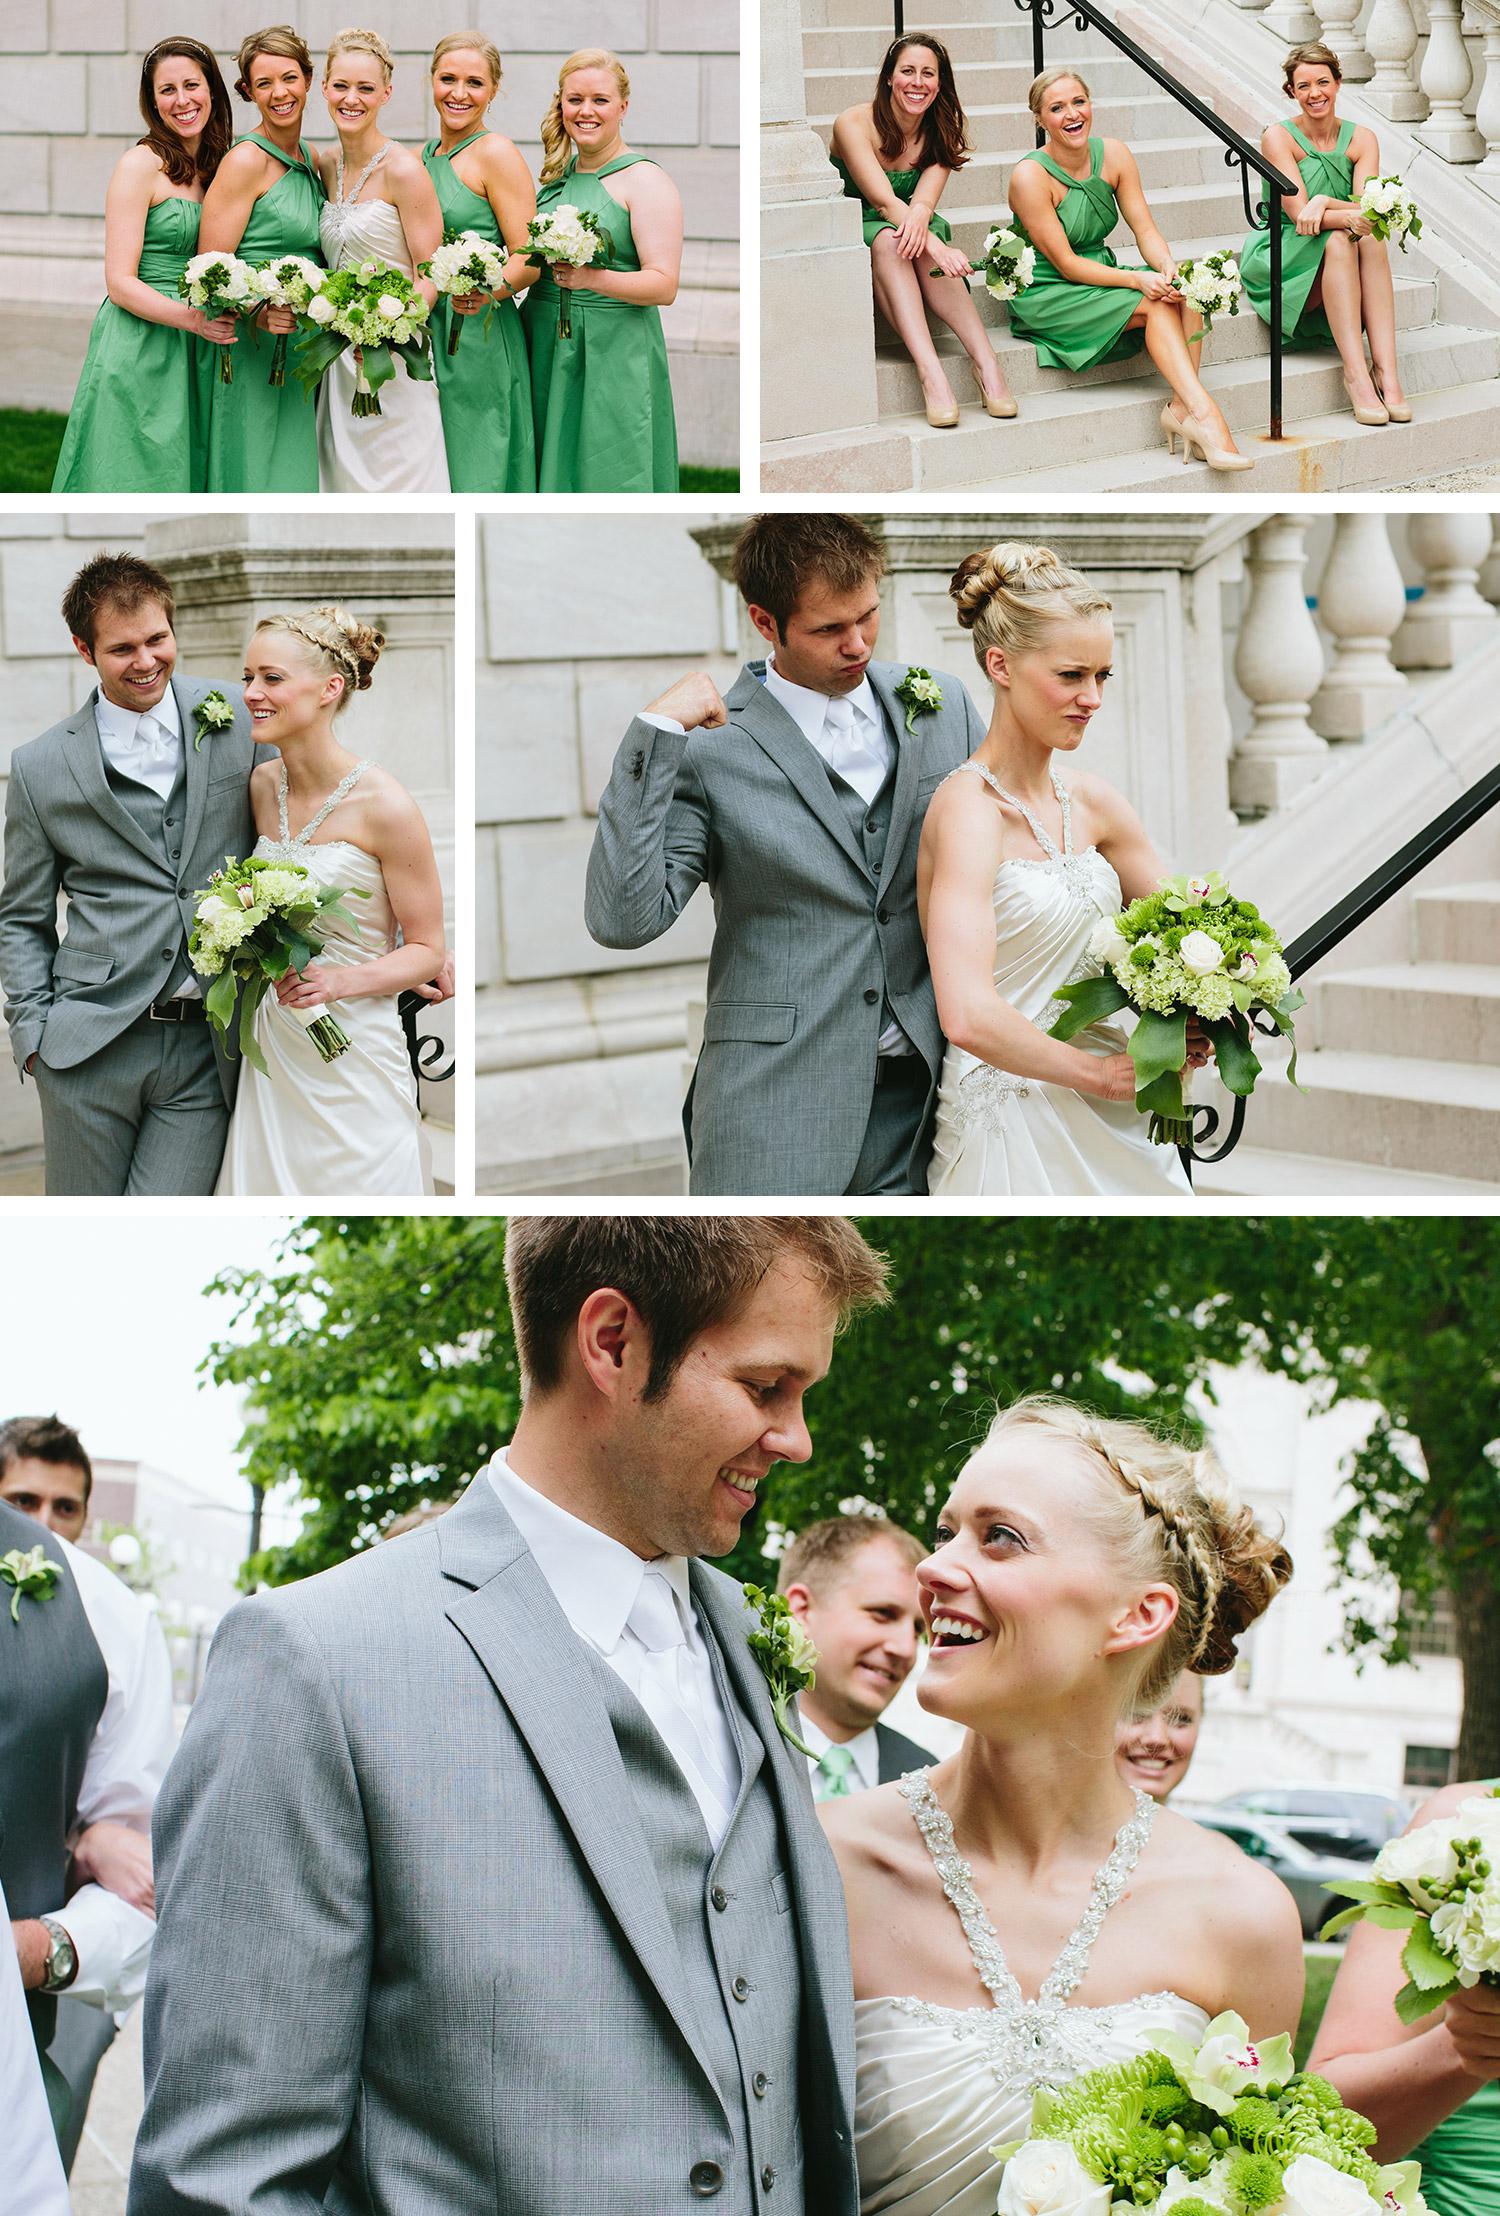 07_Saint_Paul_Hotel_Landmark_Center_wedding.jpg